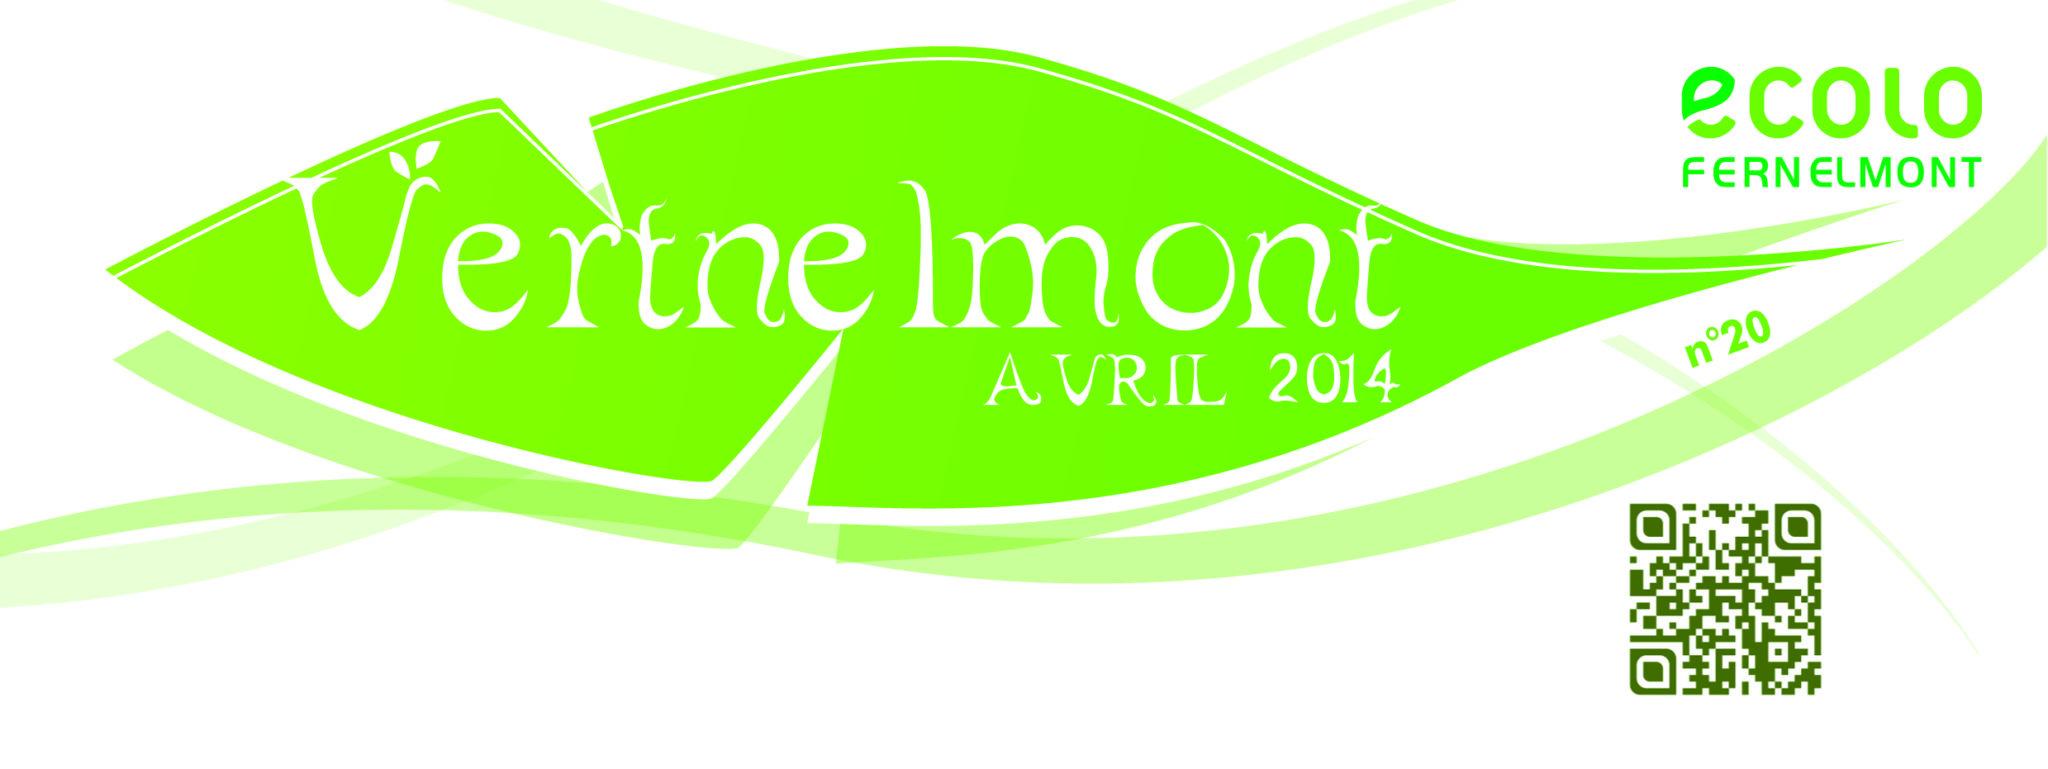 Vertnelmont 20 (avril 2014)